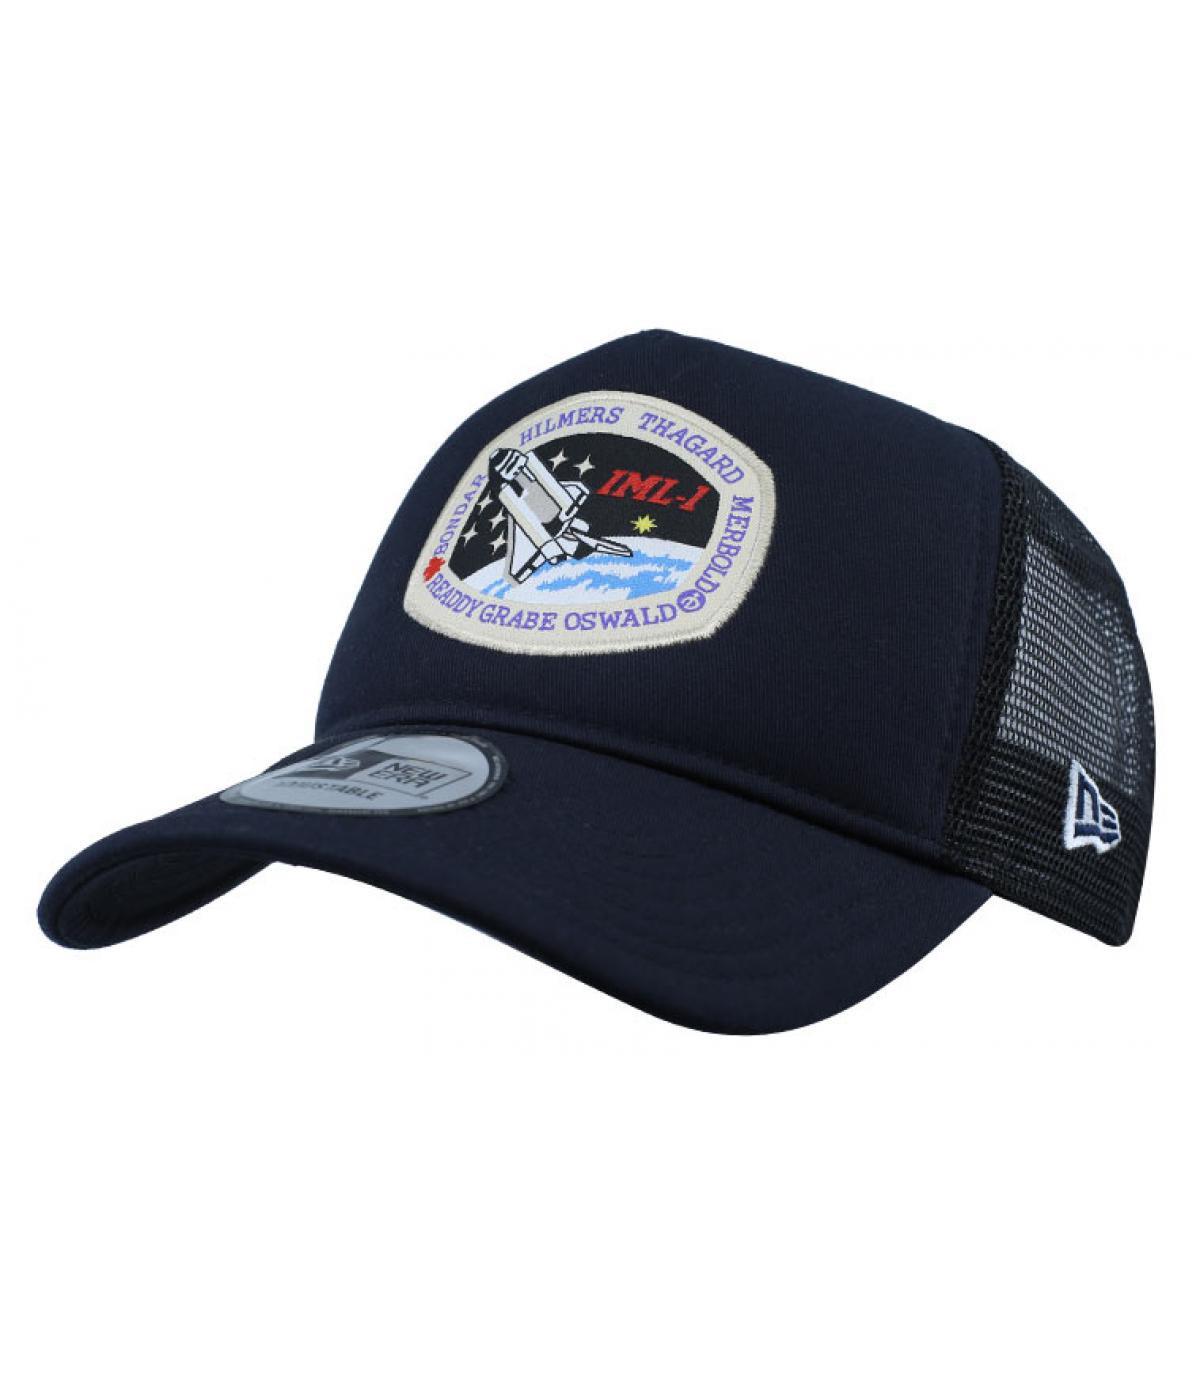 Details Trucker ISA navy - Abbildung 2